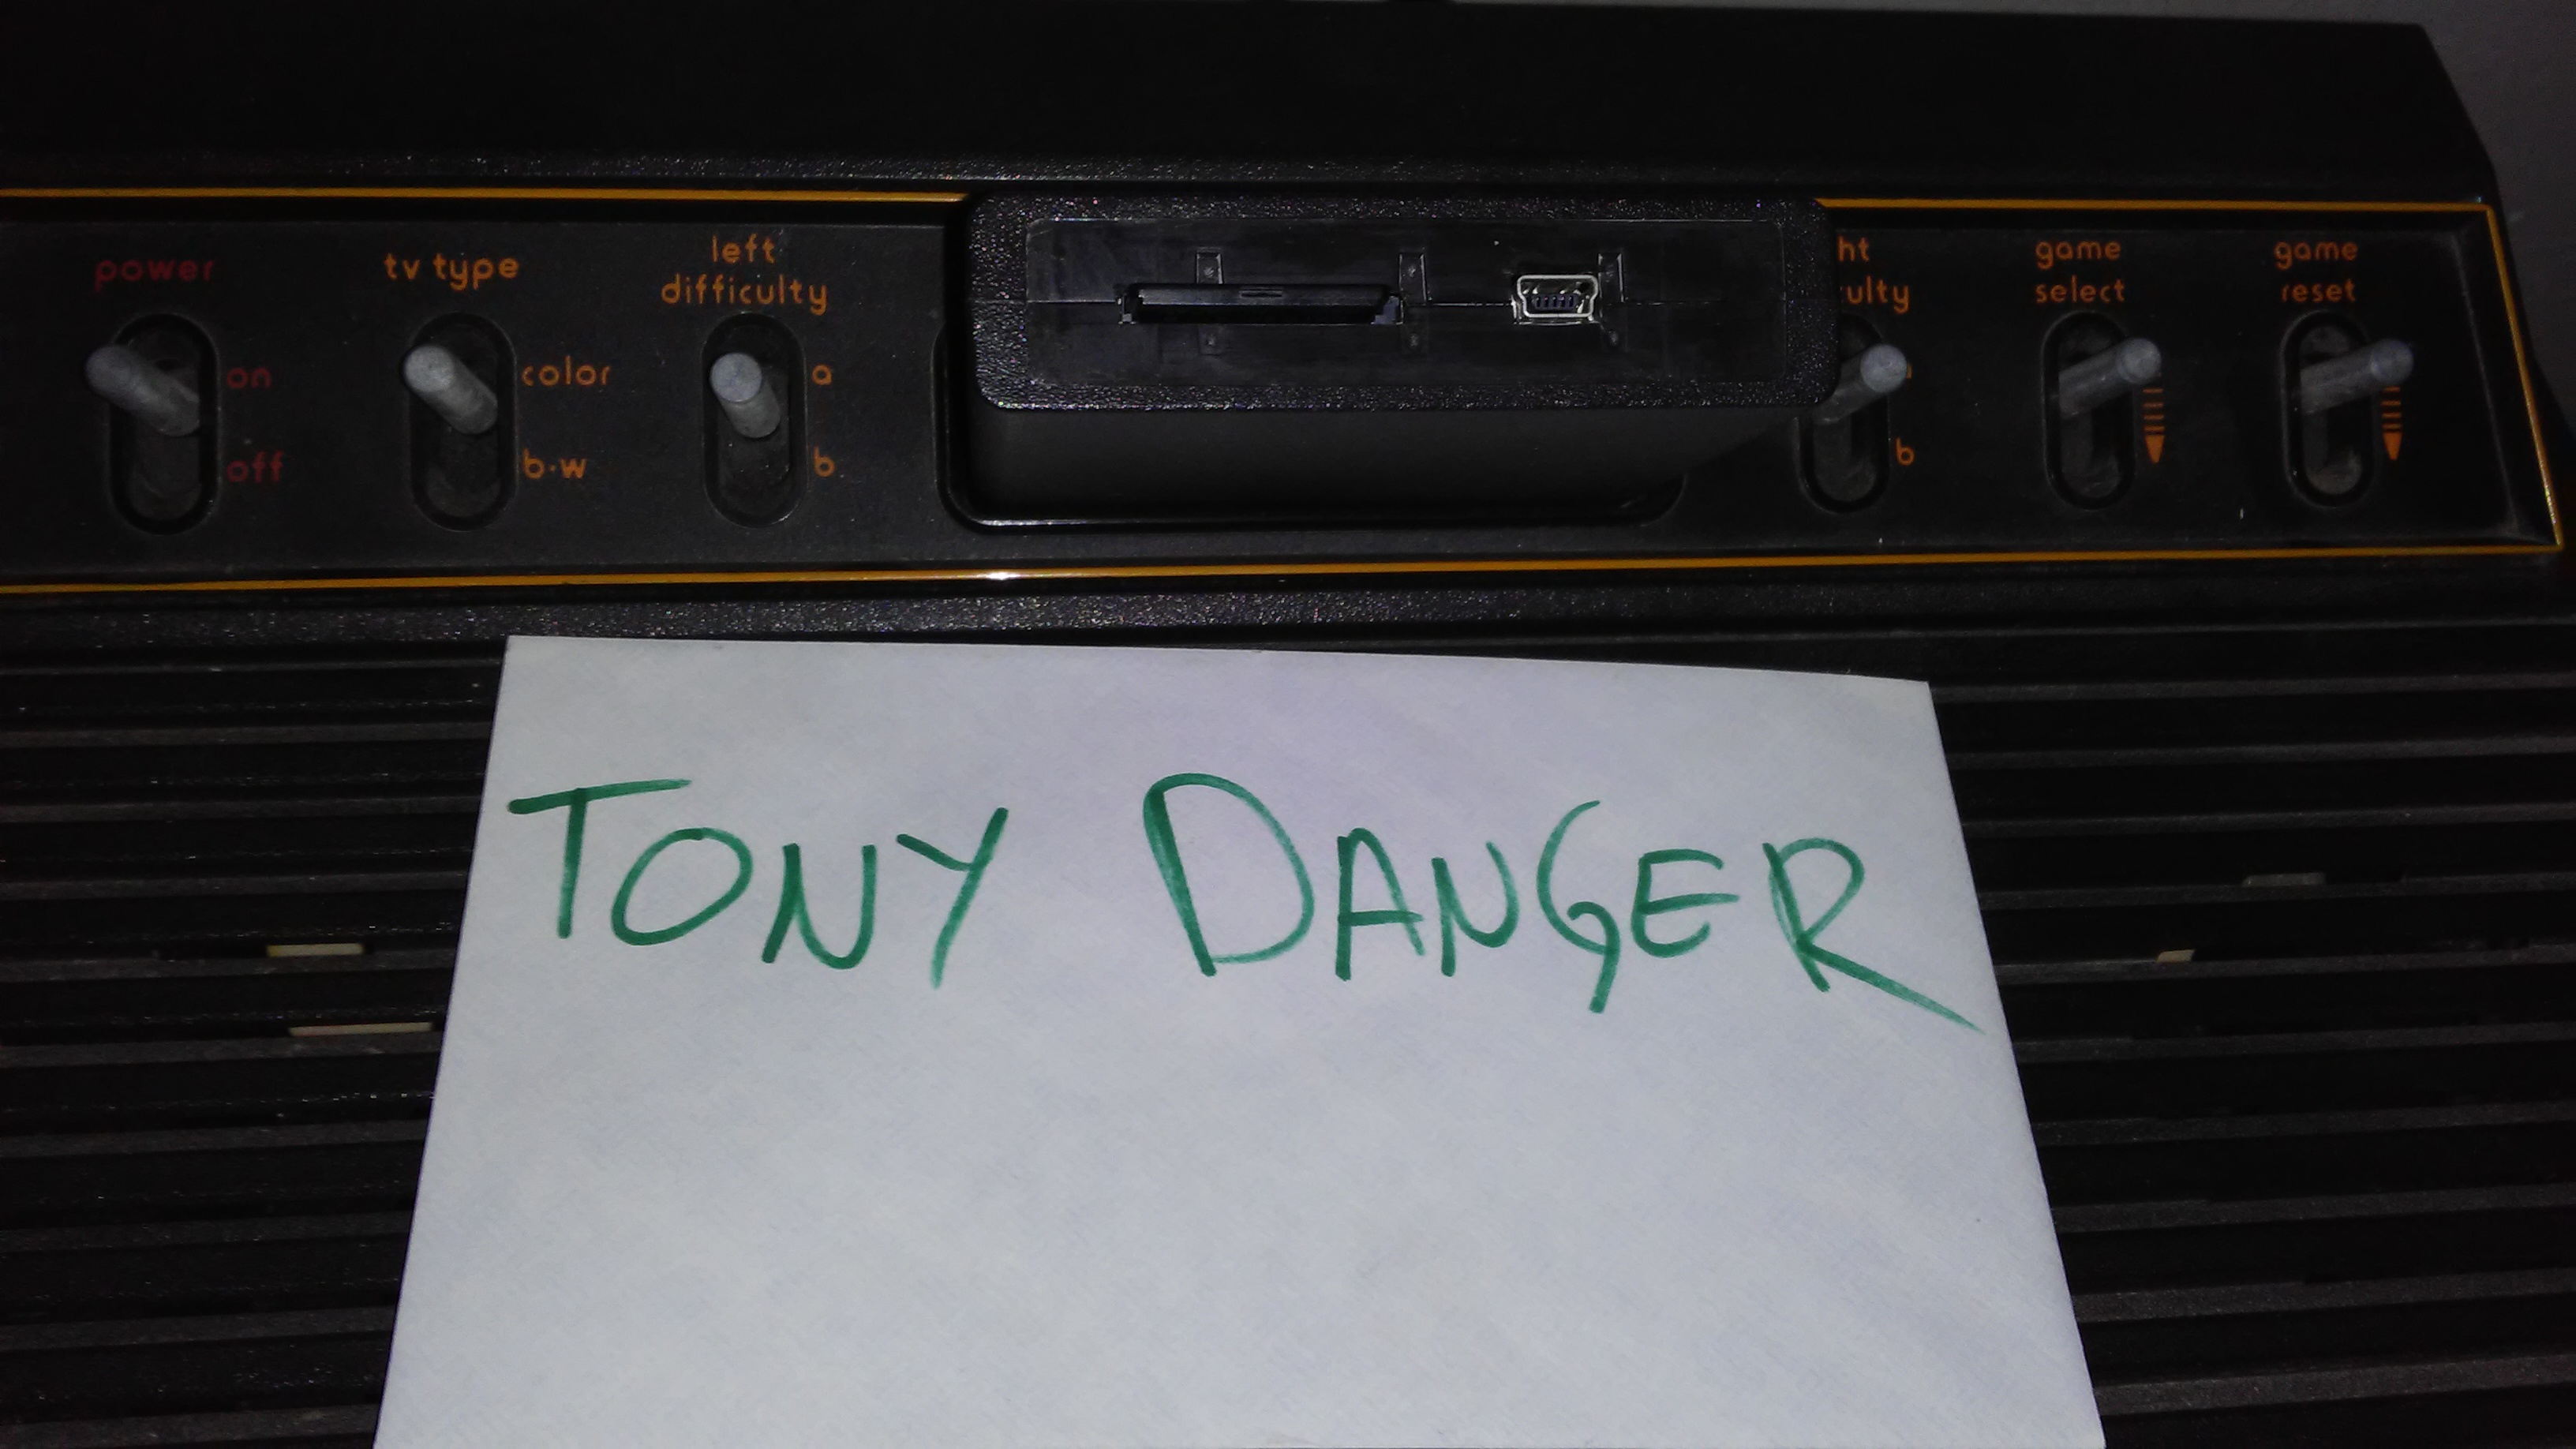 TonyDanger: Dolphin (Atari 2600 Expert/A) 136,870 points on 2016-12-20 14:44:21